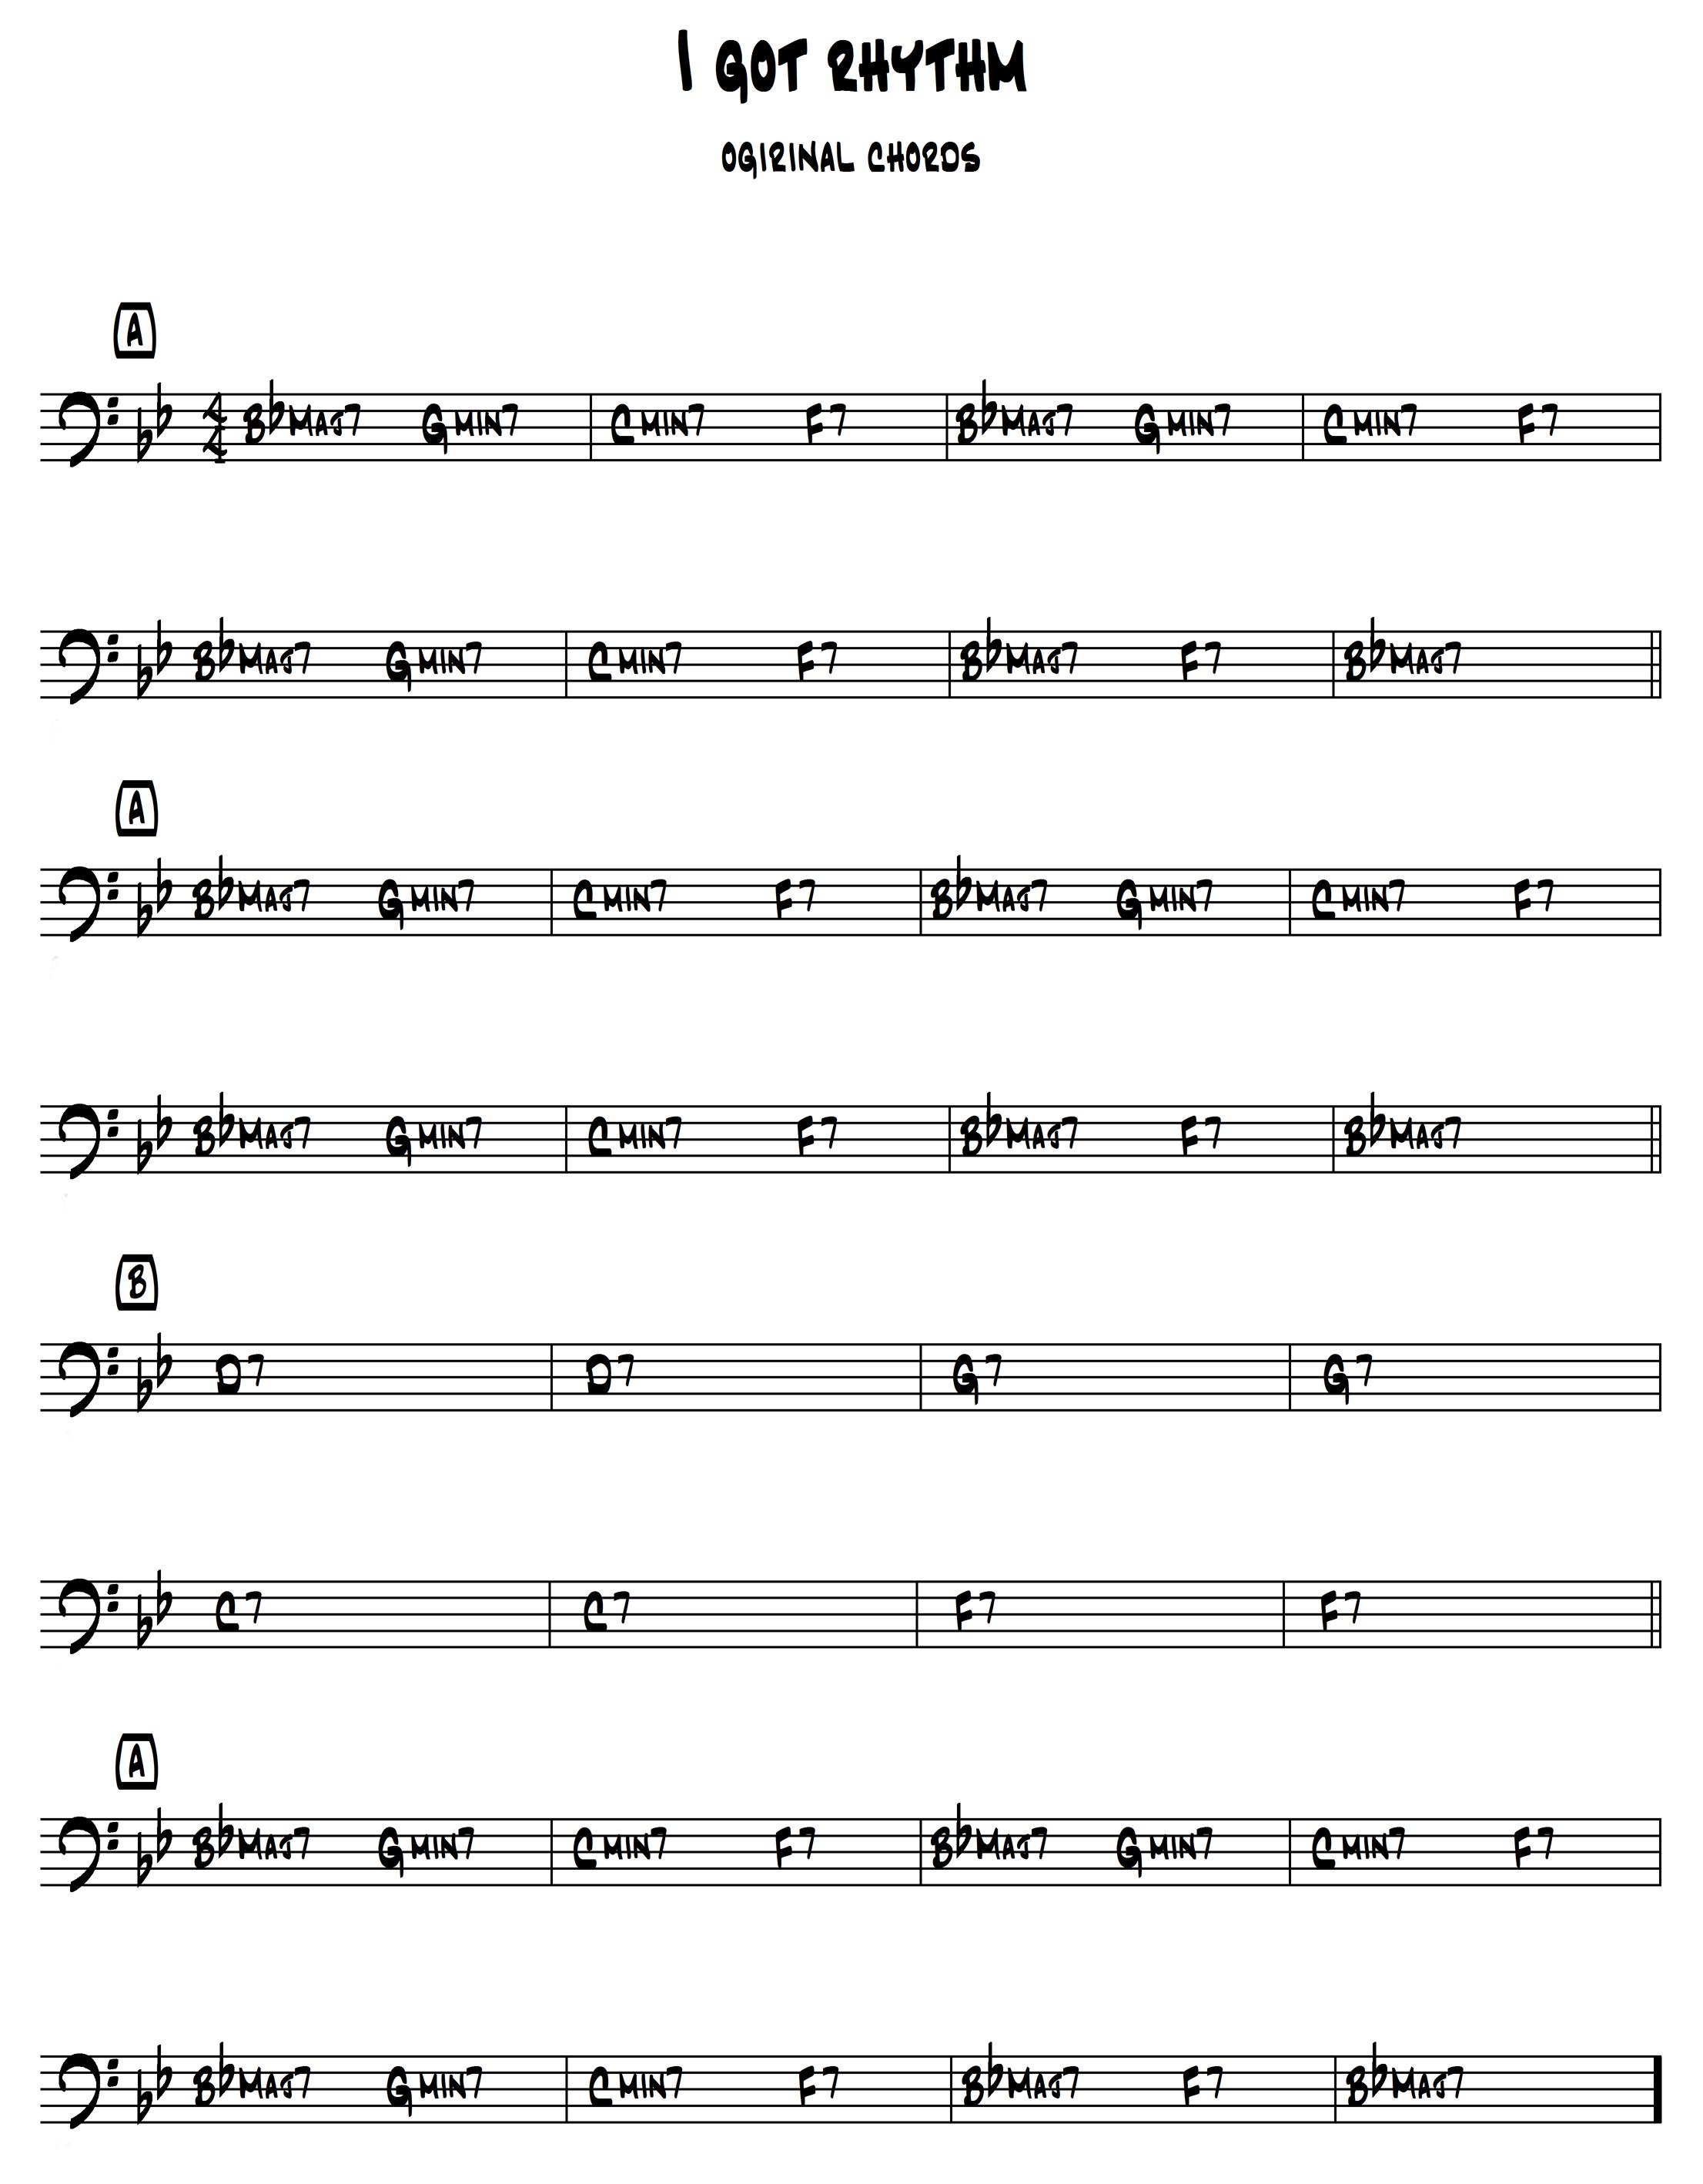 ANATOLE (rhythm changes) struttura armonica e analisi